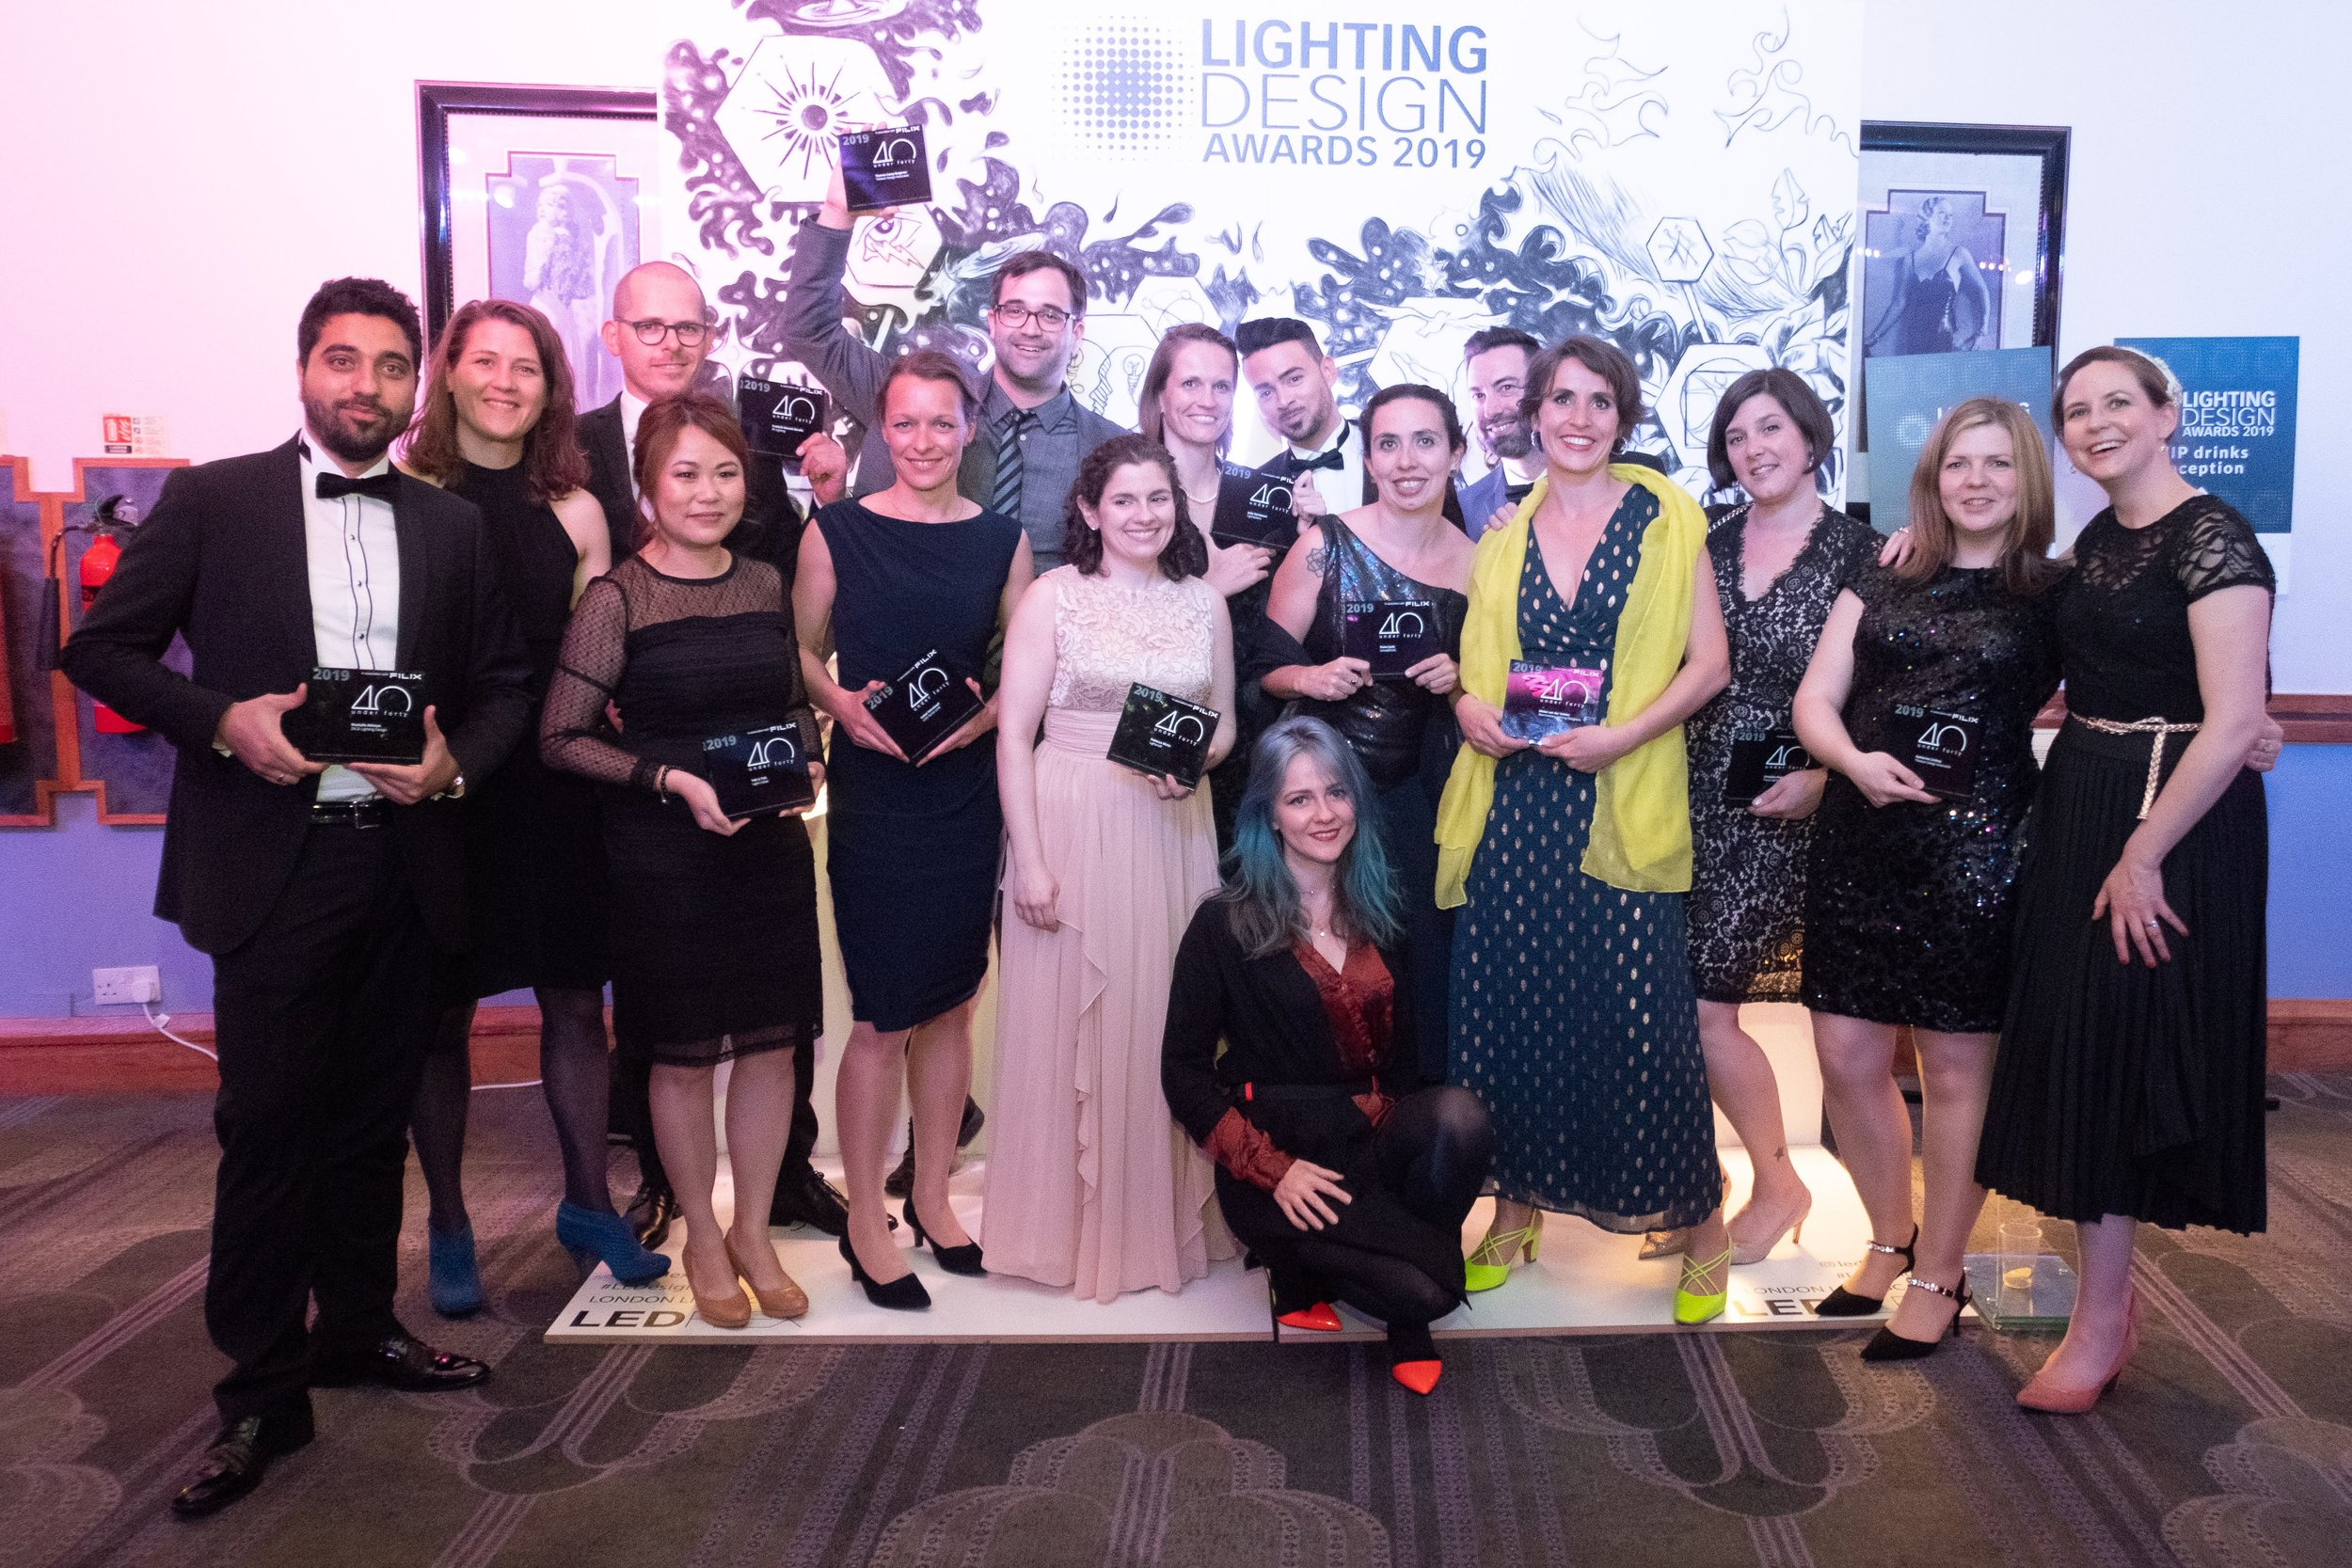 LIGHting design awards 2019 - 40under40 winners